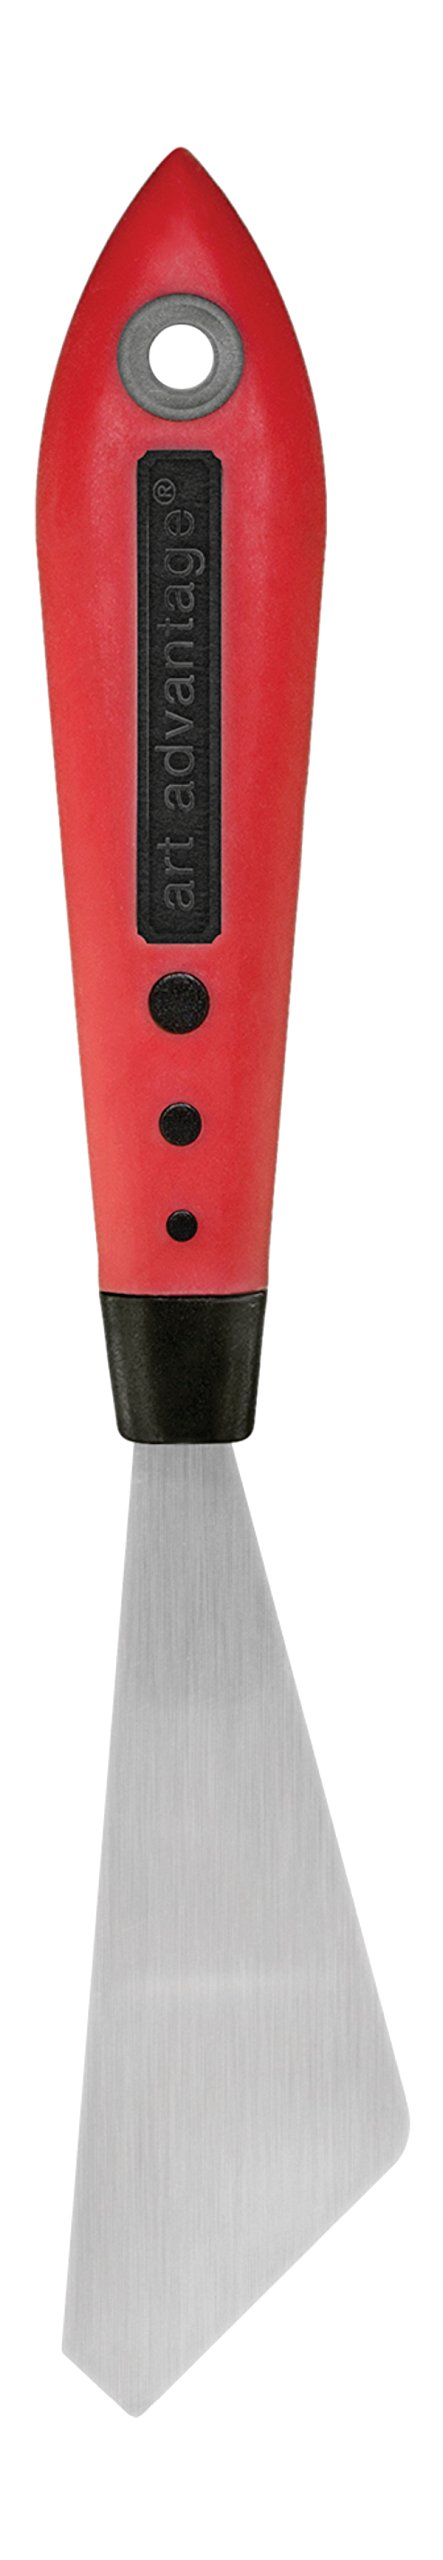 Art Advantage Painting Knife Rubber Grip, No. 8